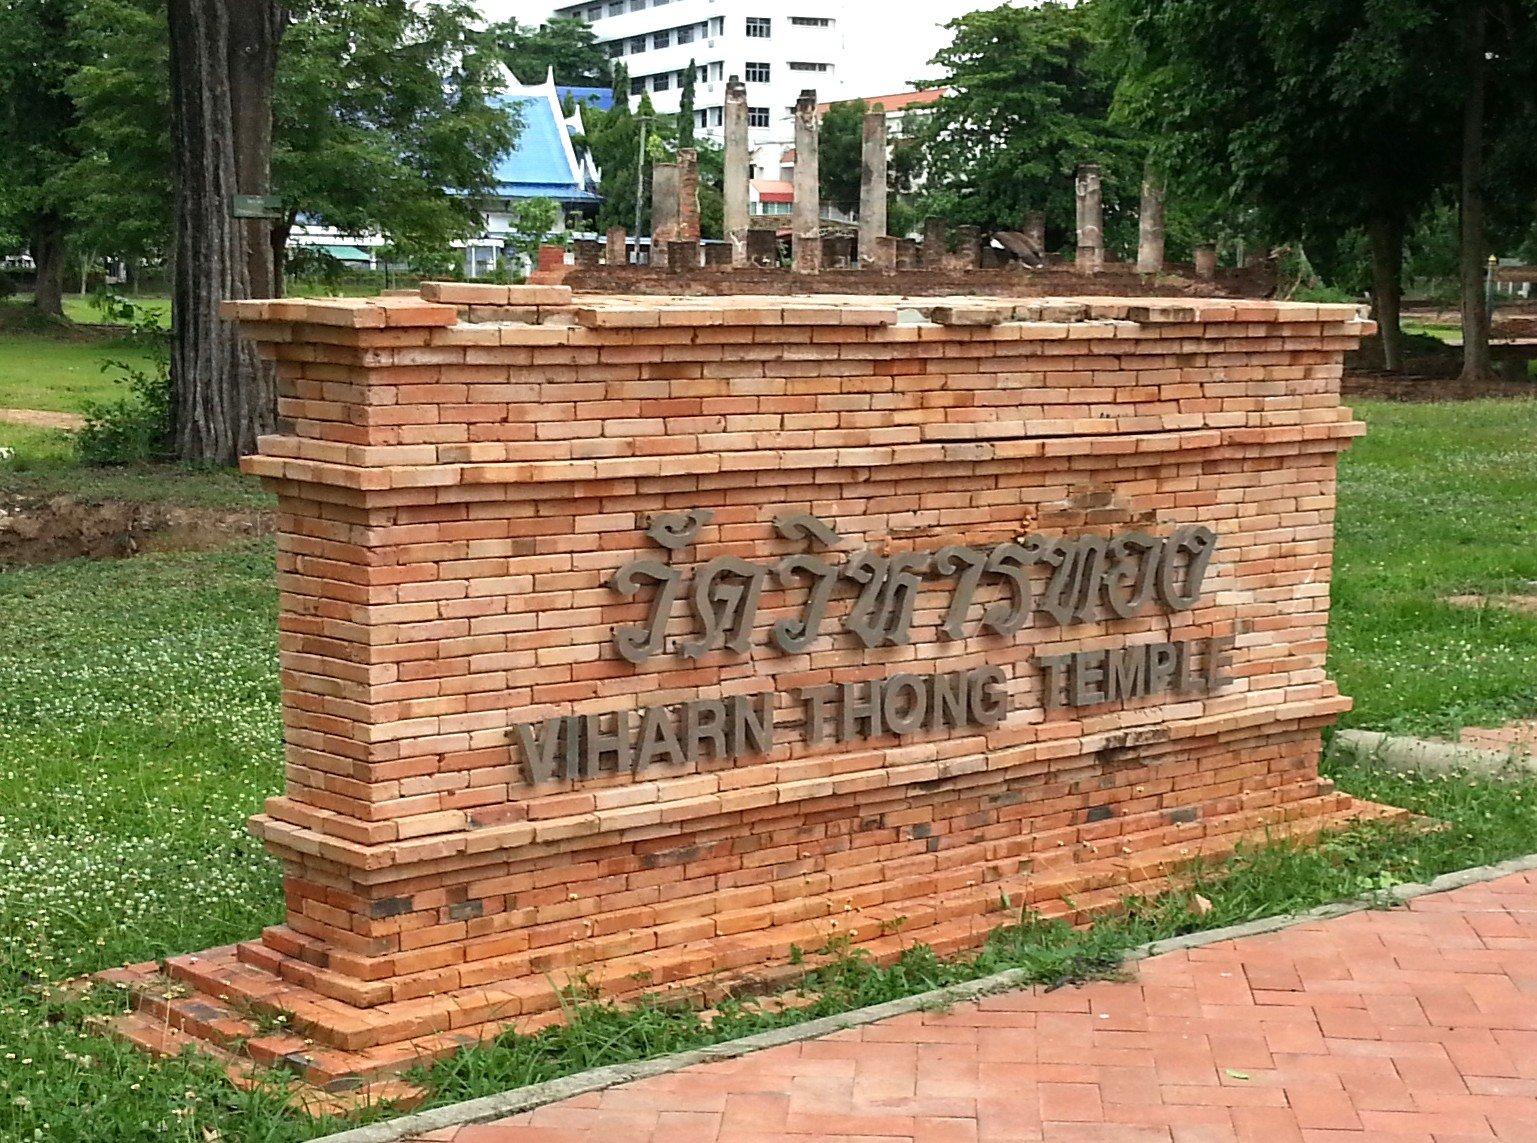 Wat Wihan Thong in Phitsanulok